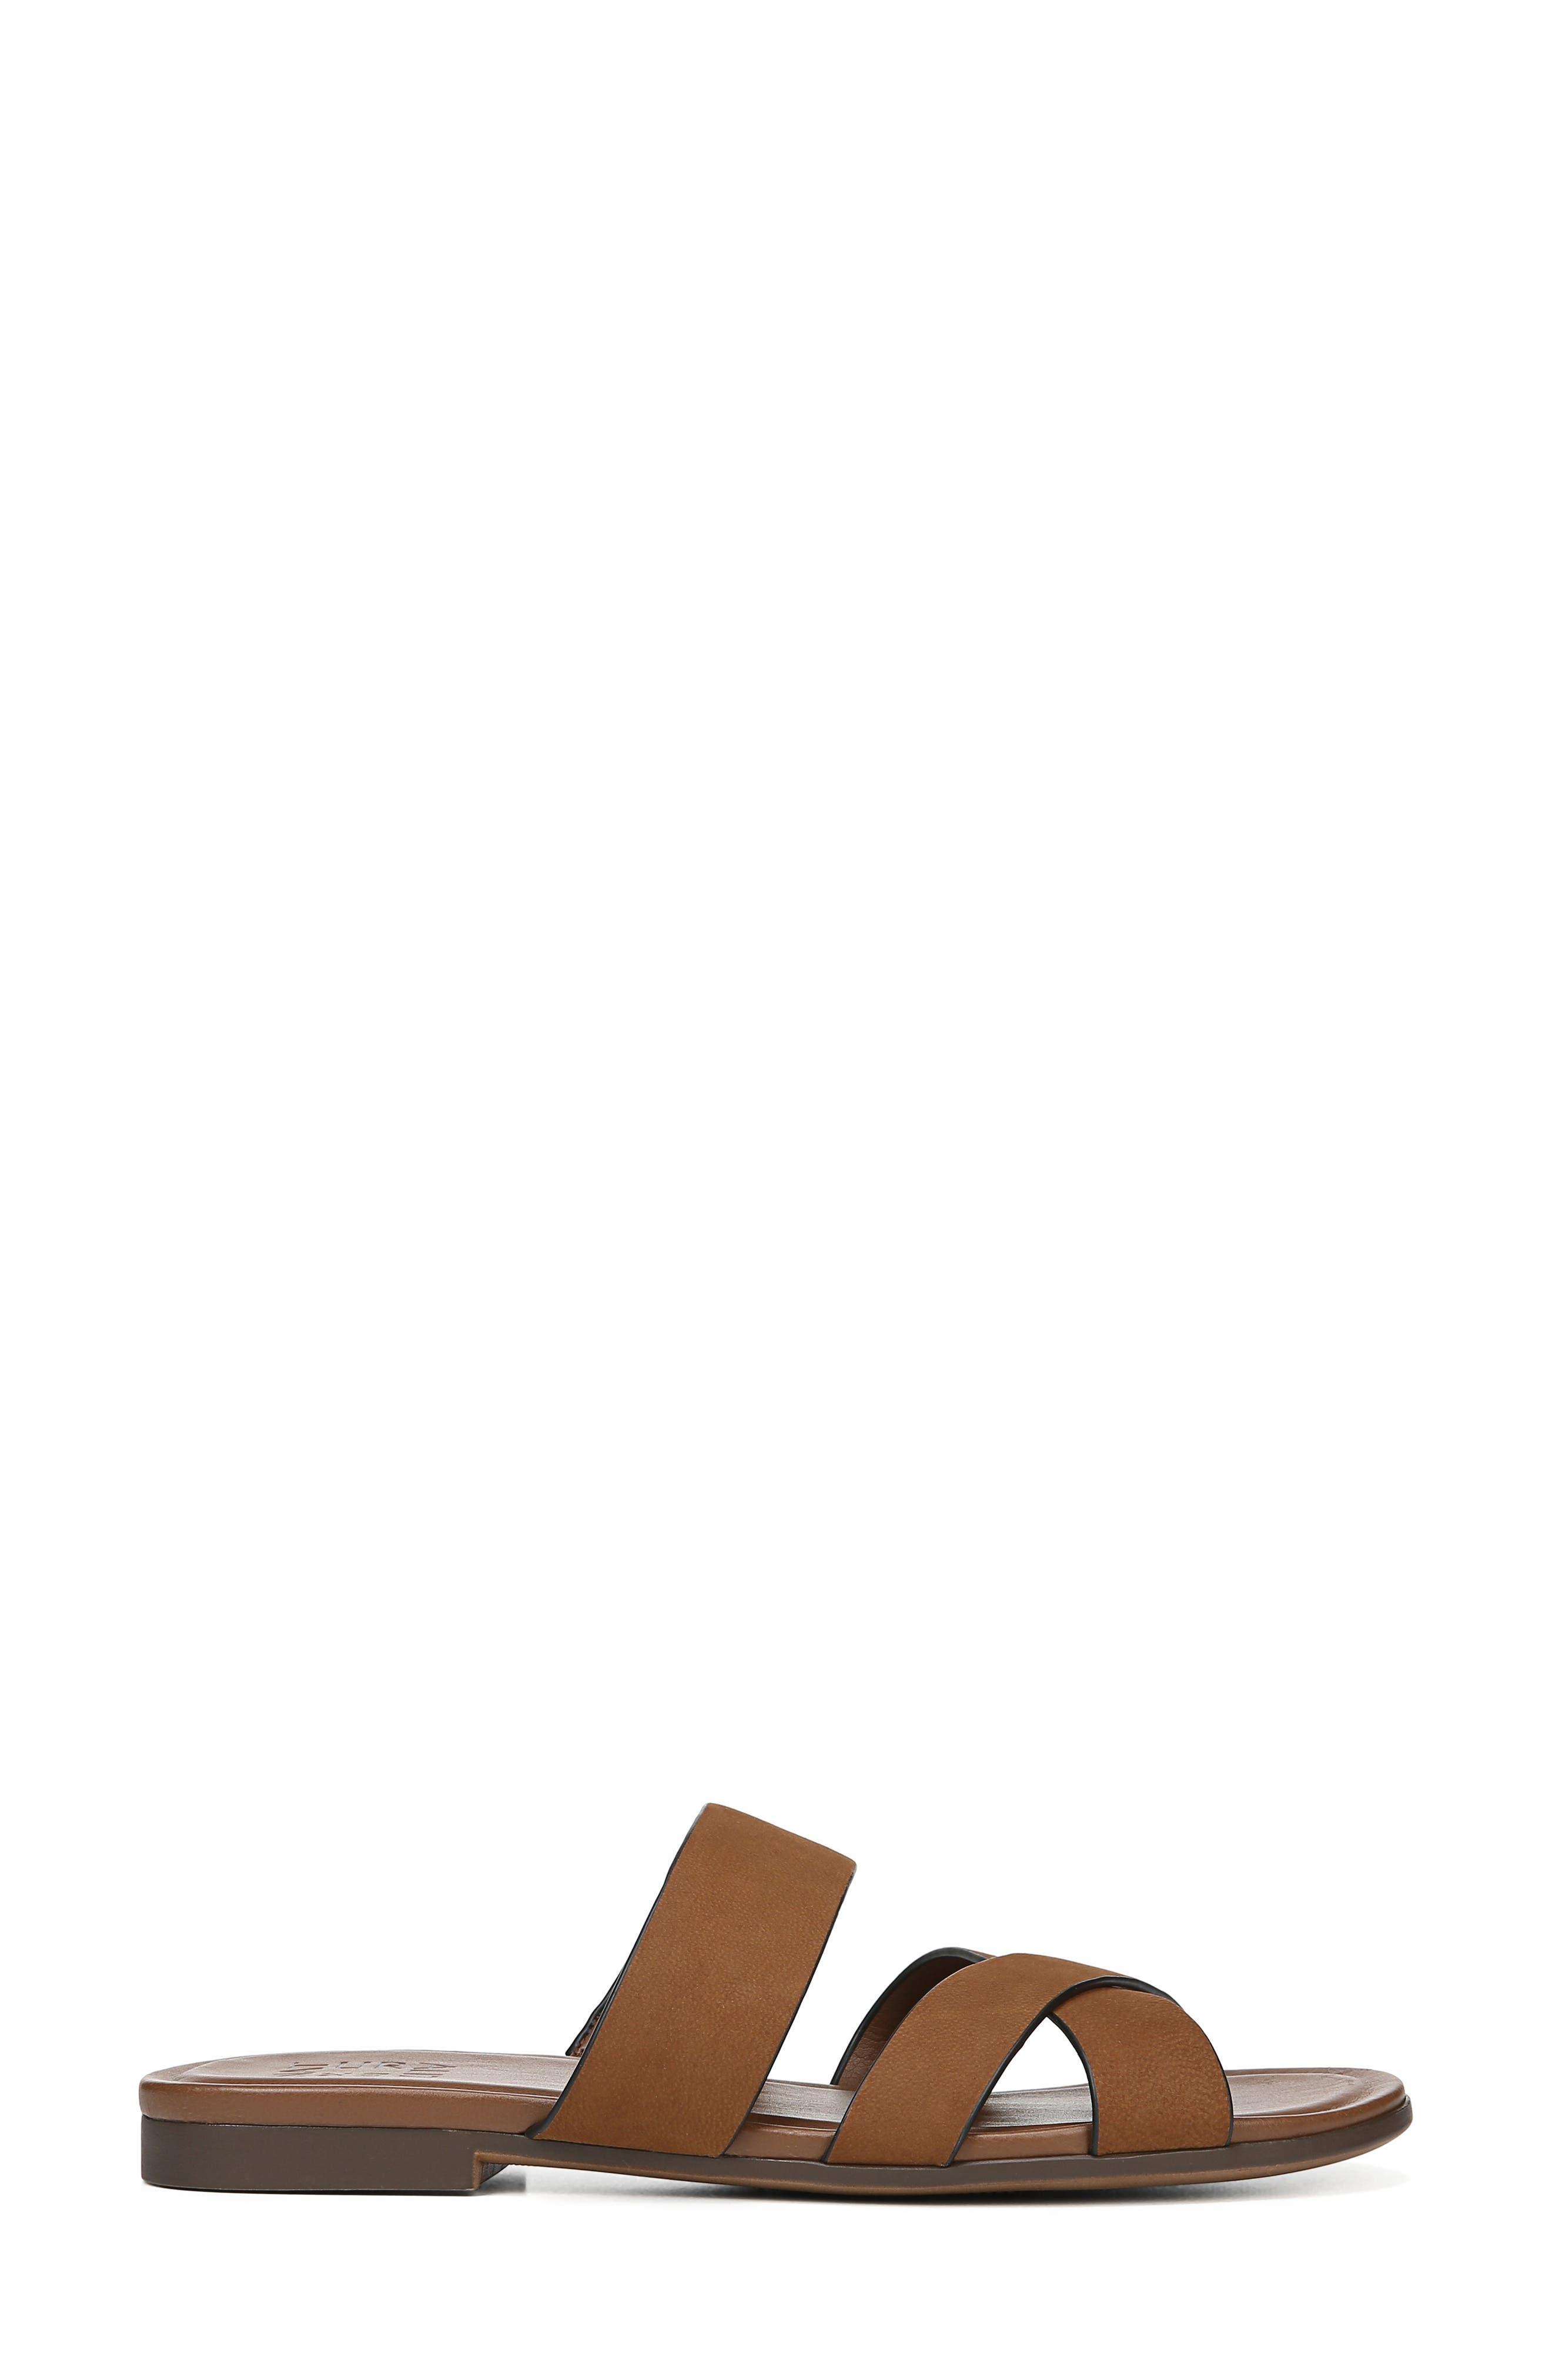 NATURALIZER, Treasure Slide Sandal, Alternate thumbnail 3, color, WHISKEY NUBUCK